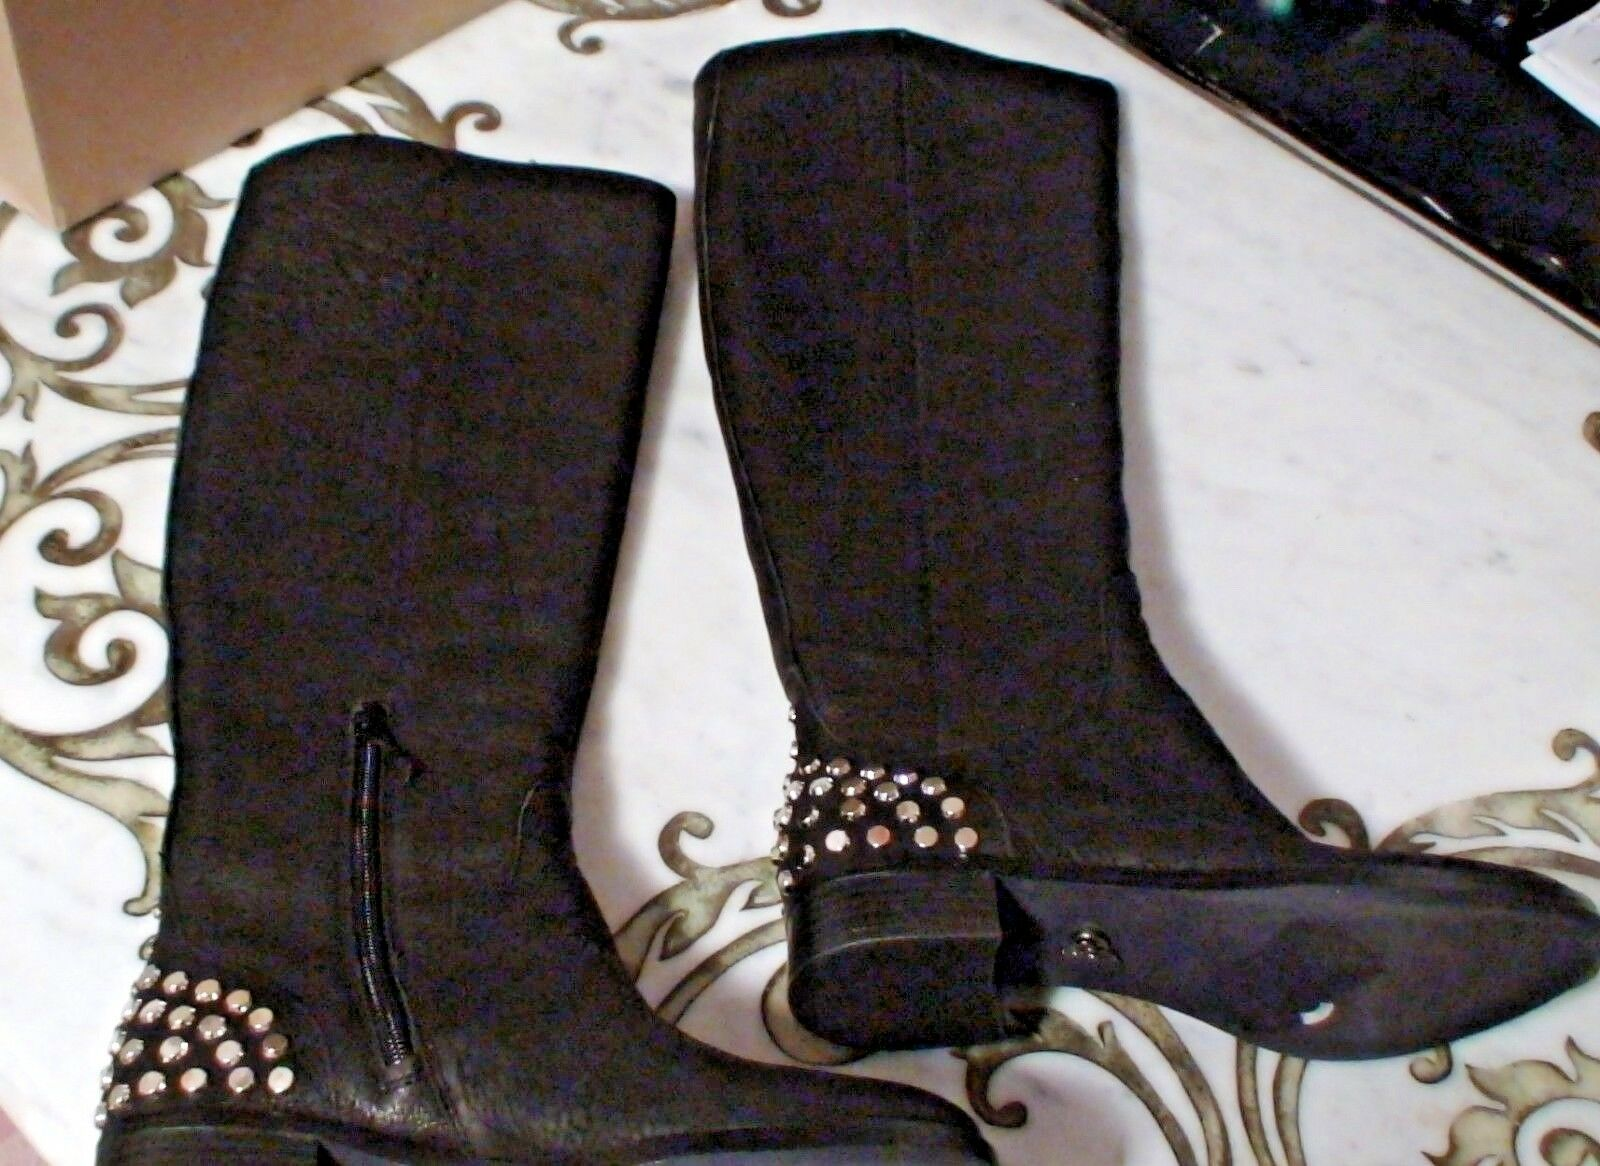 Rachel Roy Rosmeri Women Black Leather Tall Studded Boots Stud Winter Shoes 6.5